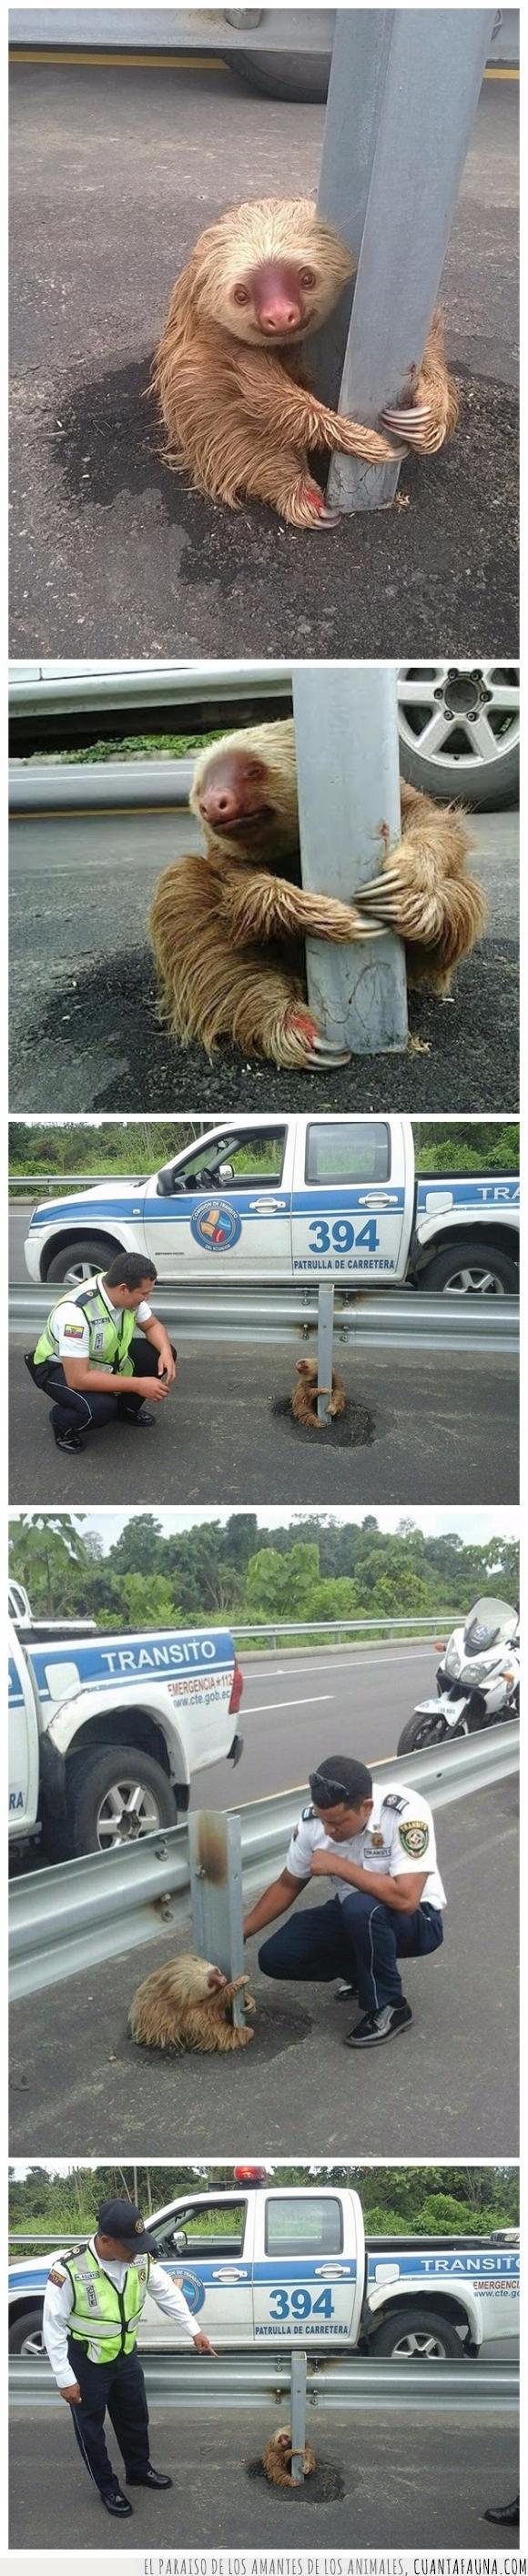 ayudar,bebe,carretera,cria,Ecuador,medio,oso,pequeño,perezoso,policía,salvar,susto